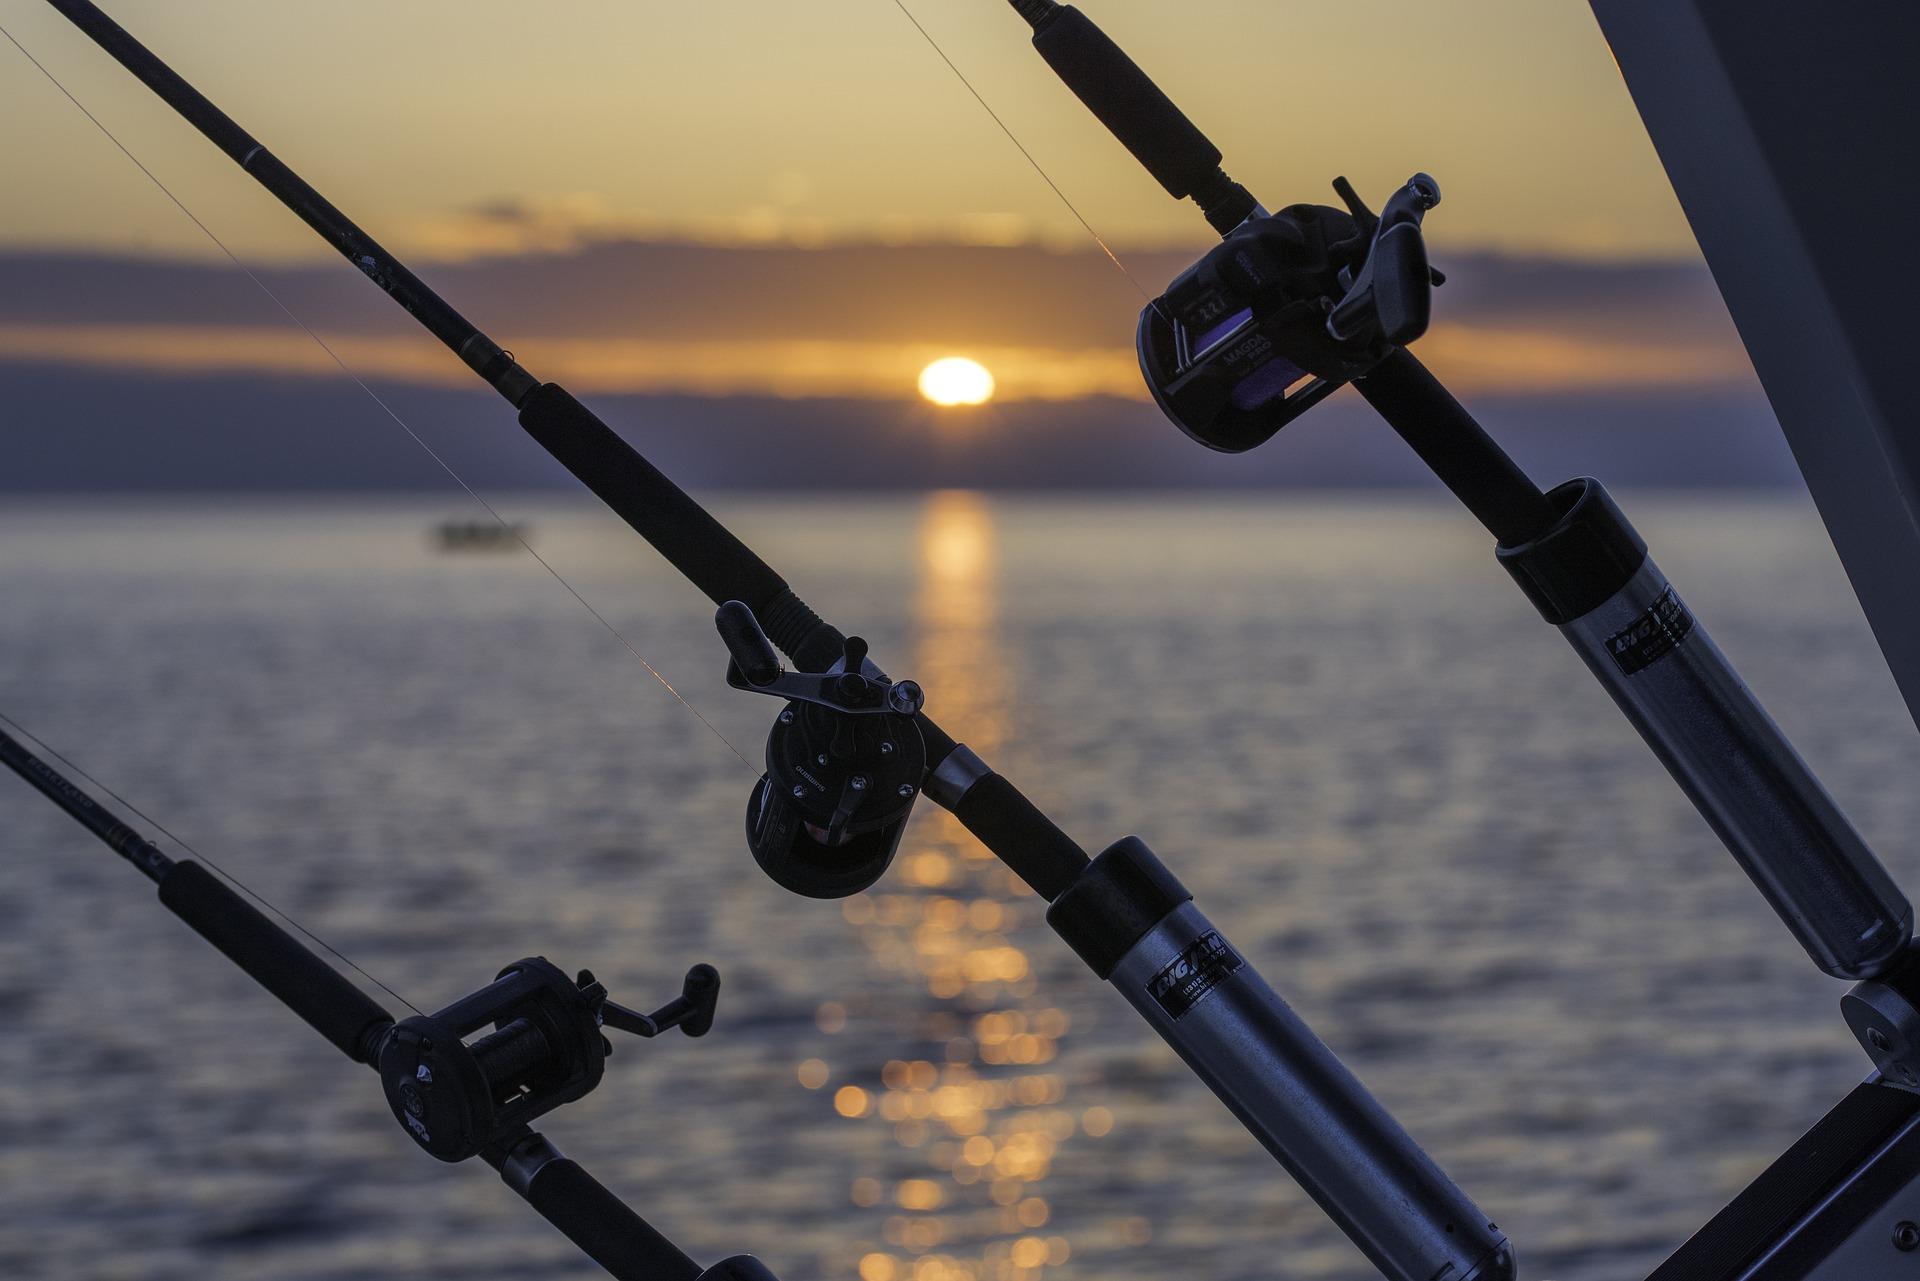 deep-sea fishing rods